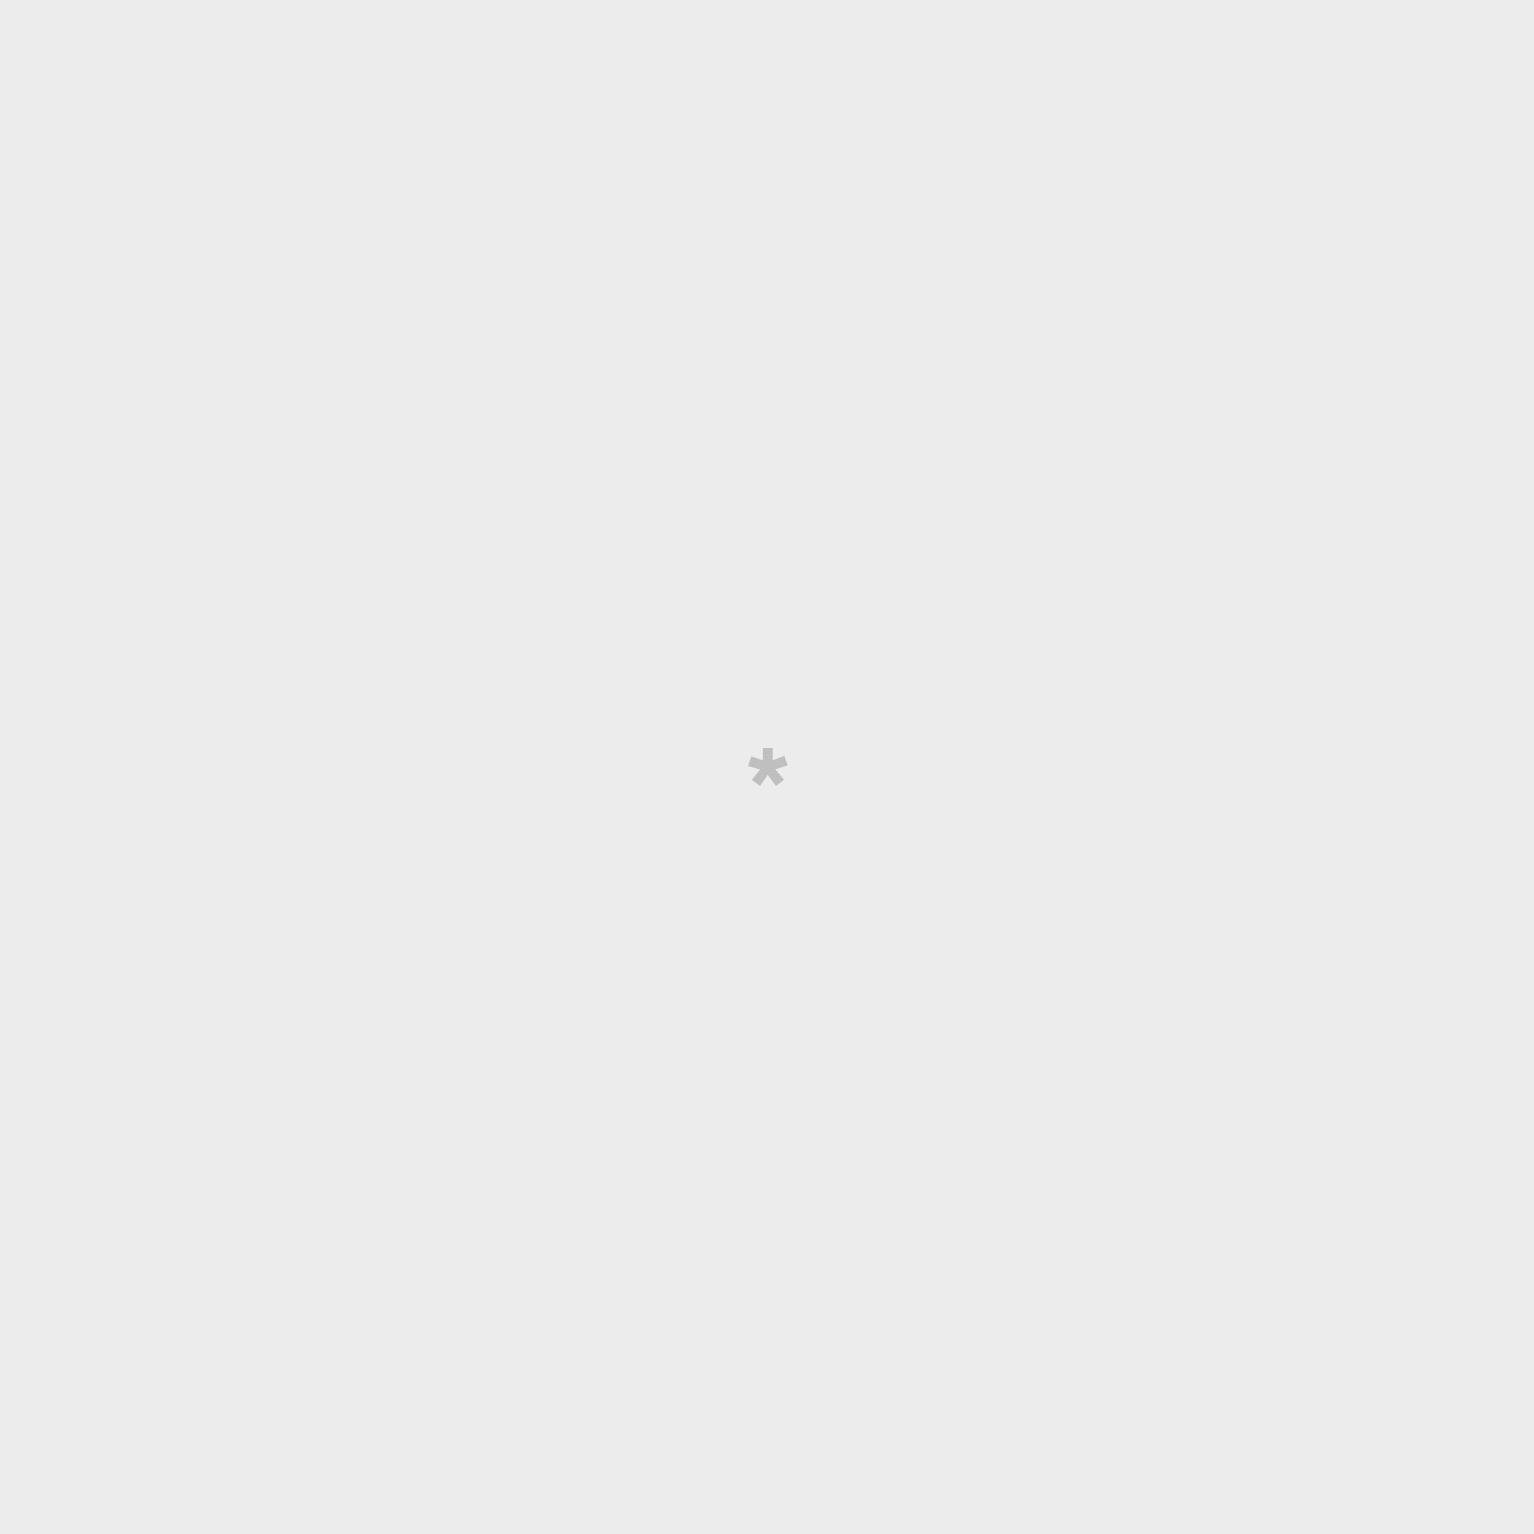 Cartes de grossesse - Les grands moments de ma grossesse